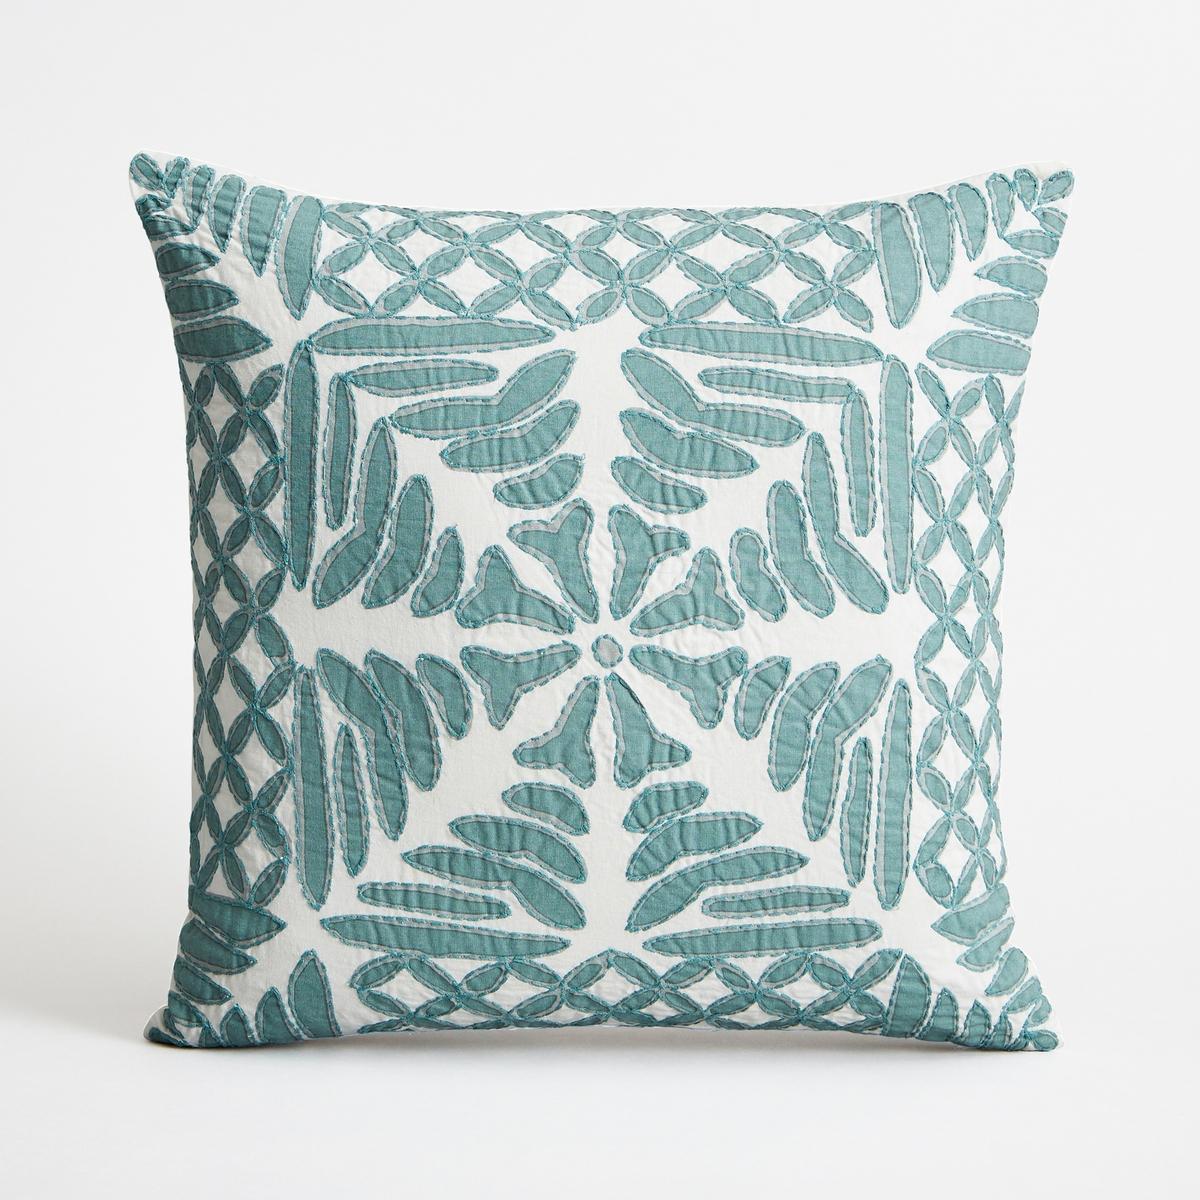 Наволочка на подушку-валик, Sanzone<br><br>Цвет: зеленый